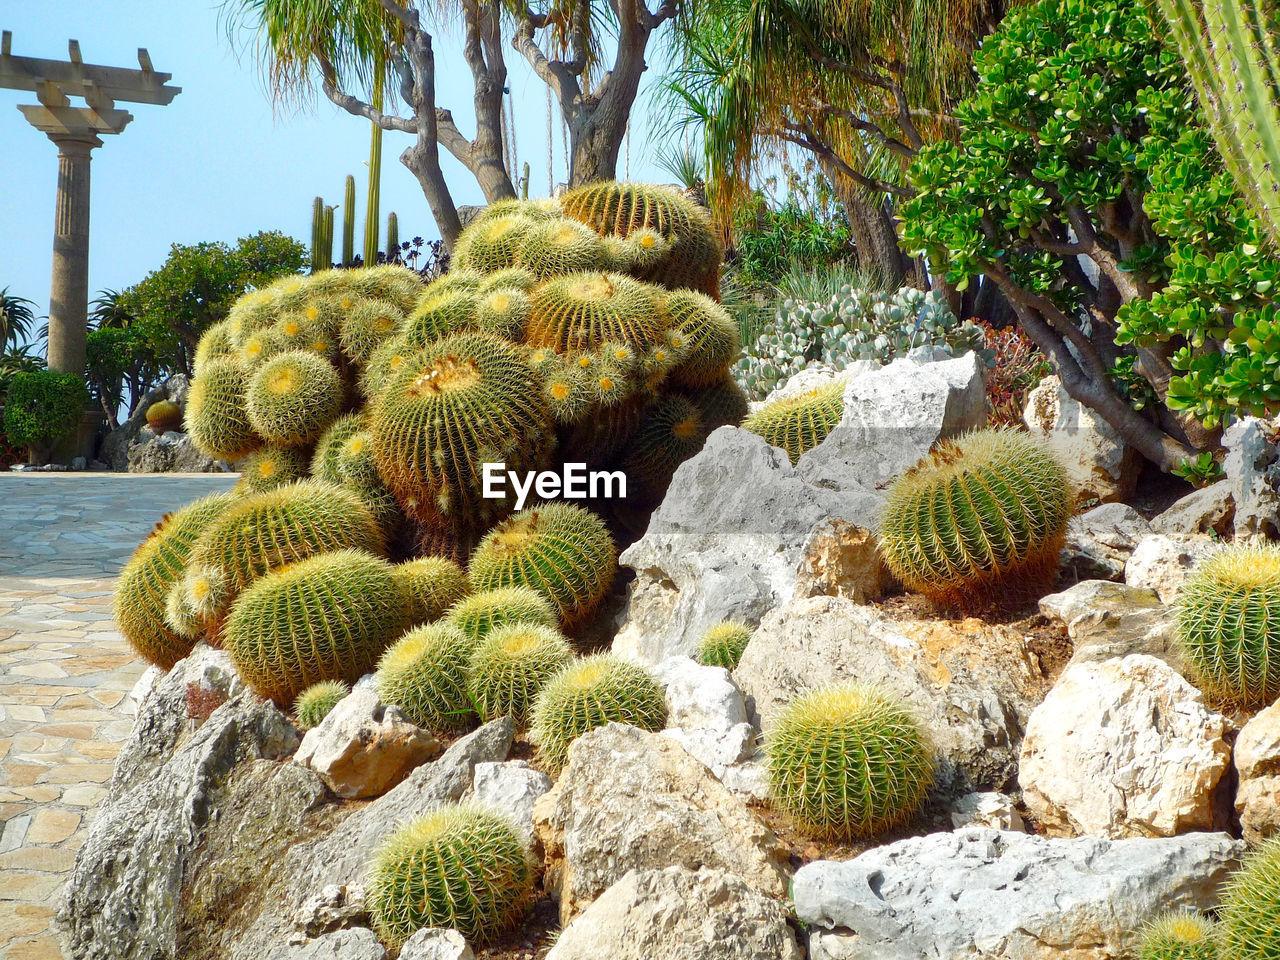 Close-up barrel cactus on rocks